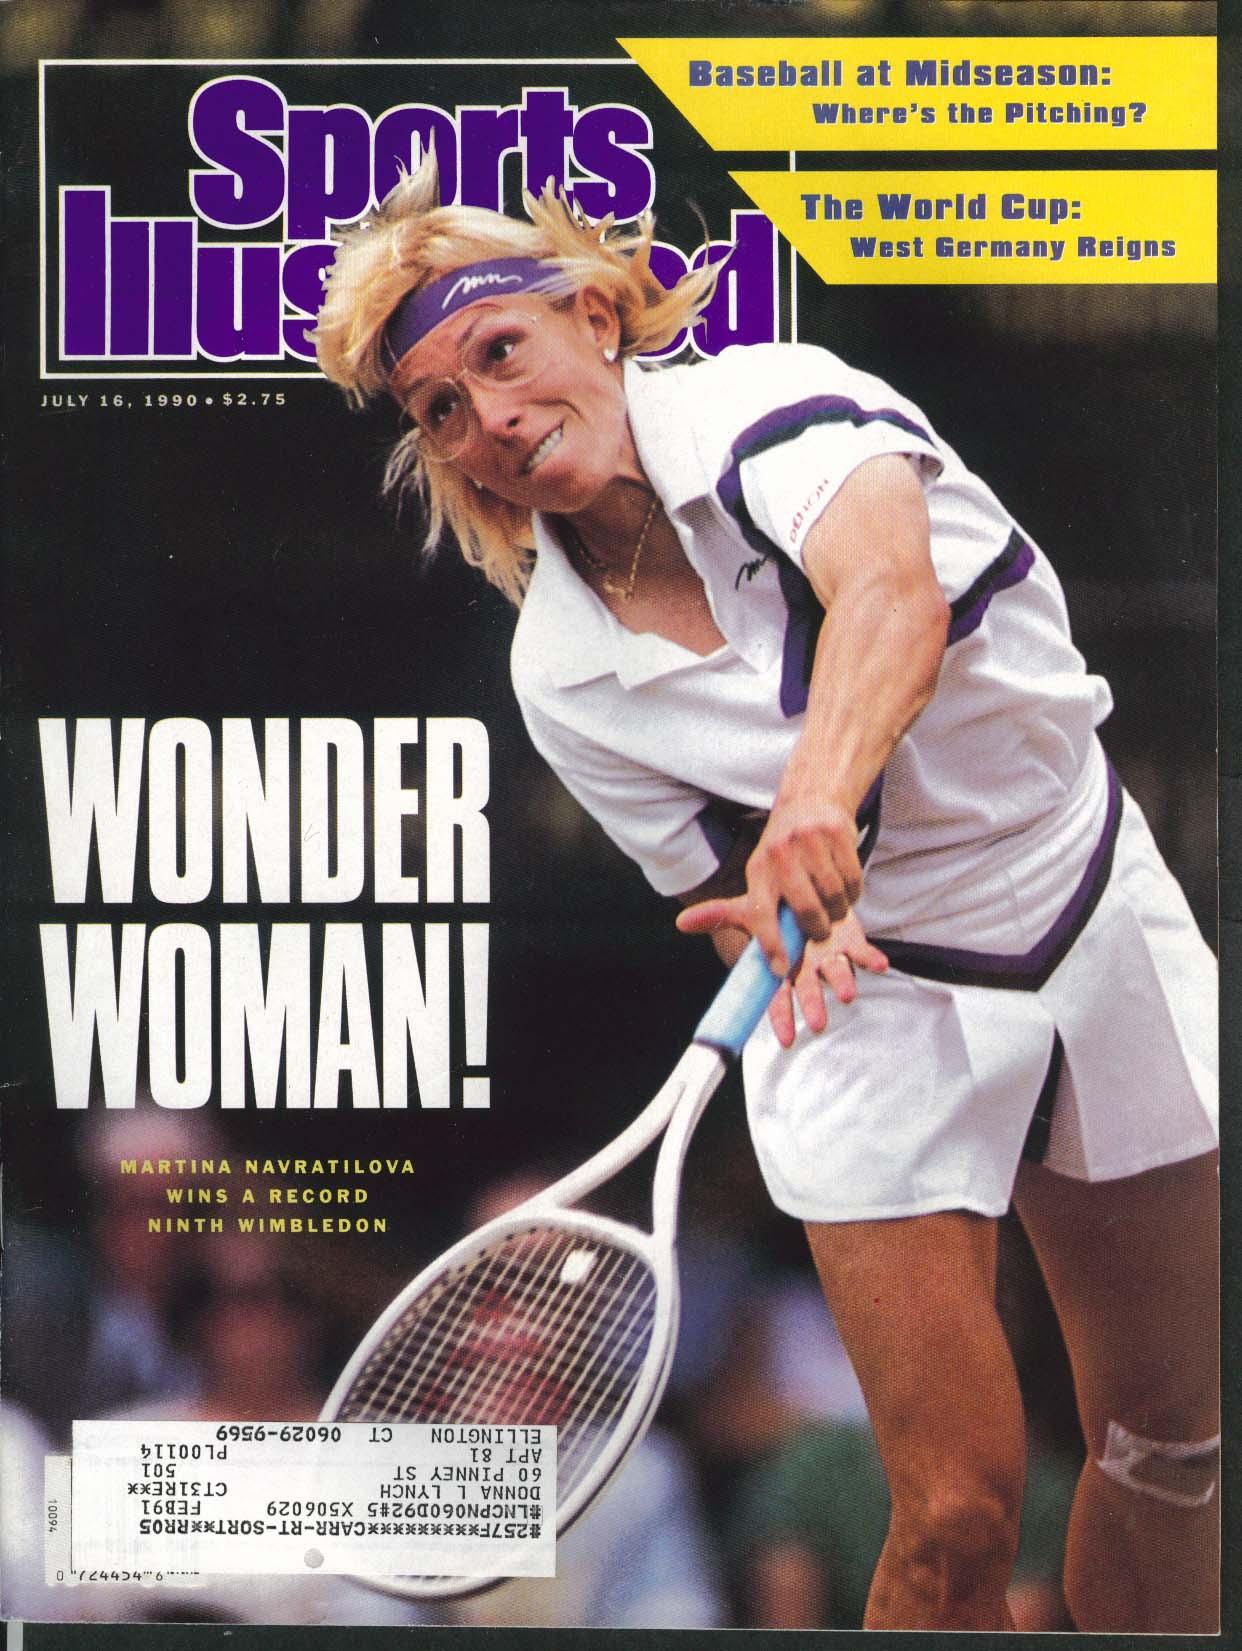 SPORTS ILLUSTRATED Martina Navratilova Dan Quayle Dean Beman 7/16 1990